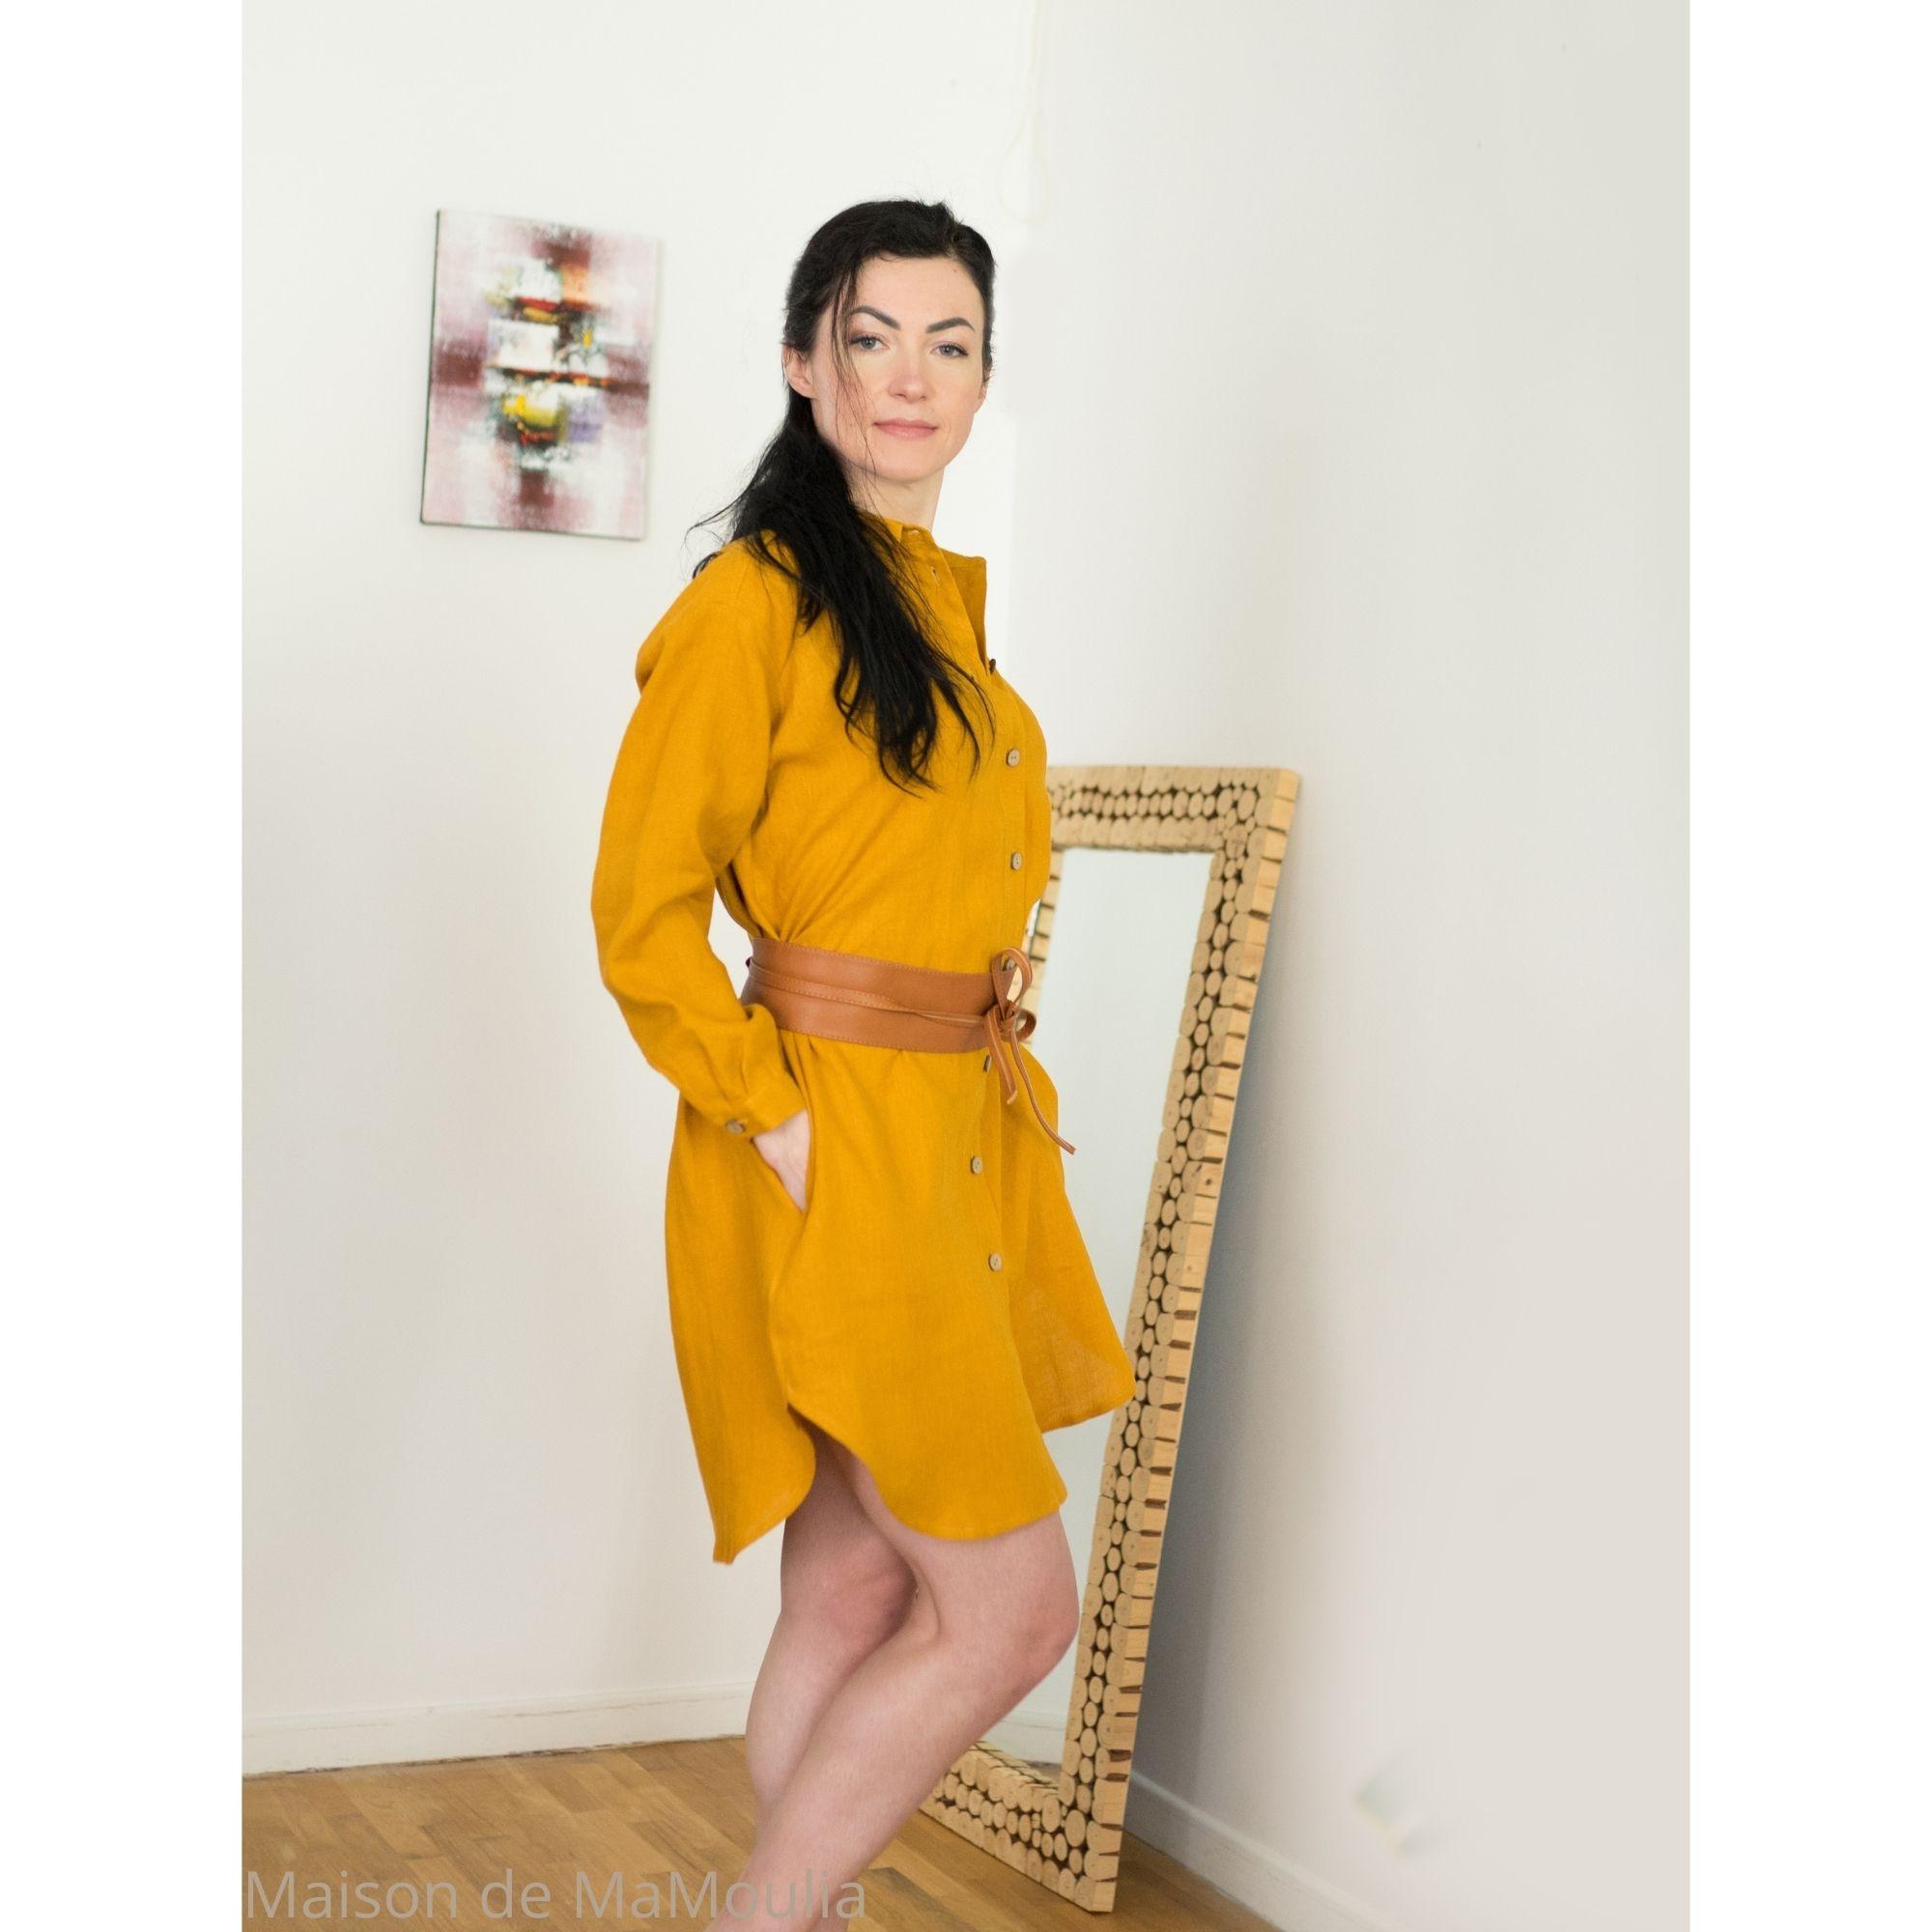 OFFON - Robe-chemise oversize - 100% lin lavé - Moutarde